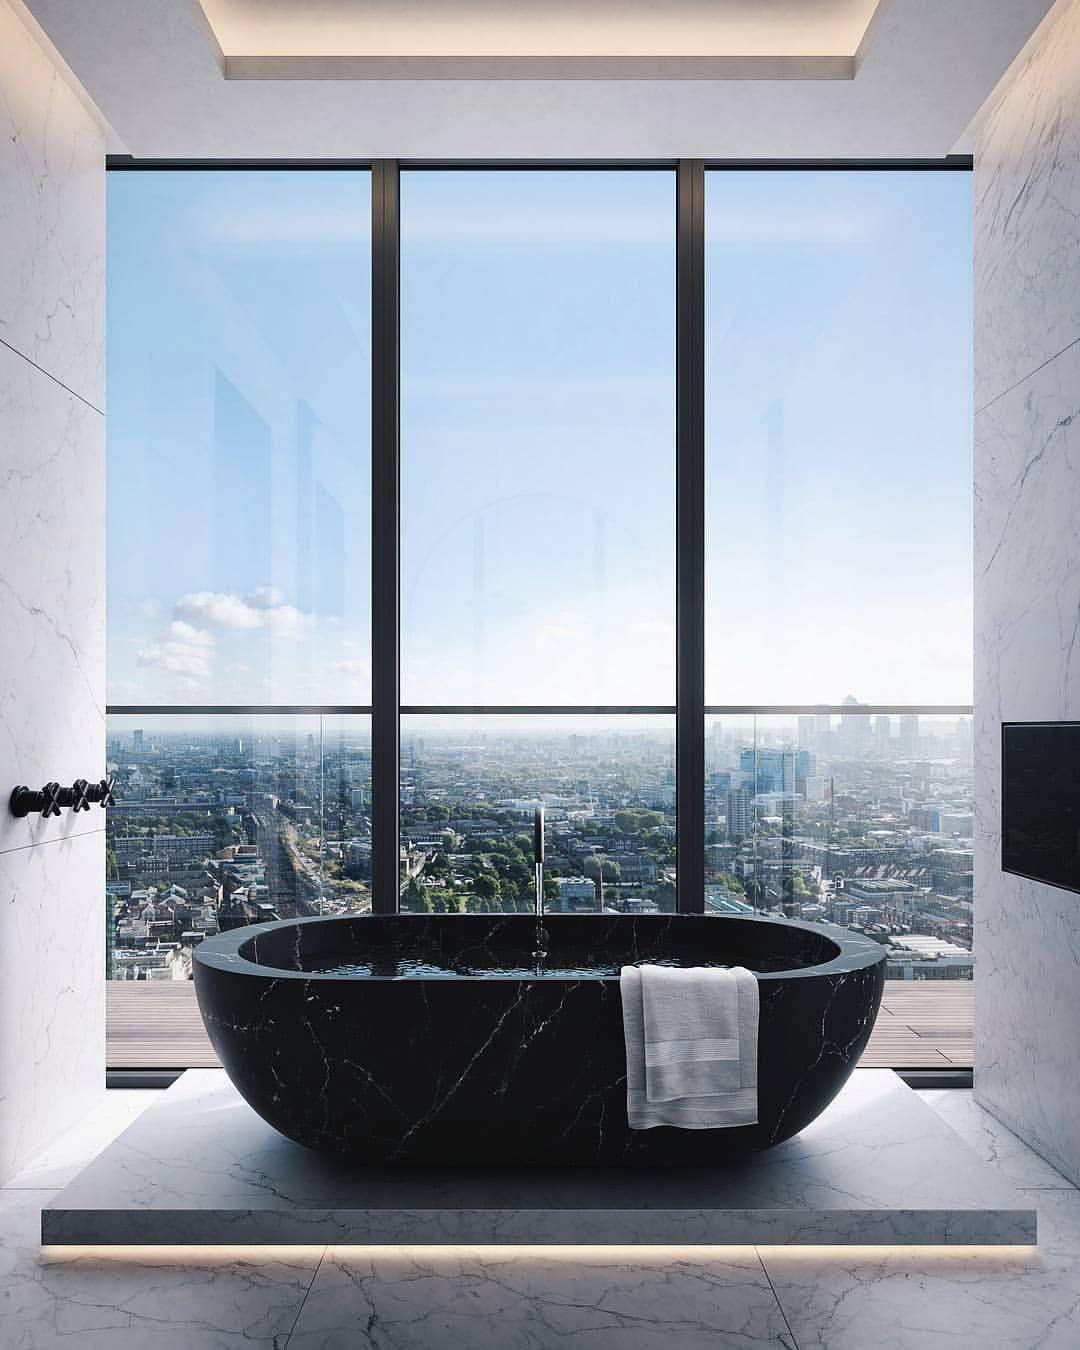 COCOON bathtub design bycocoon.com | bathtub design inspiration ...